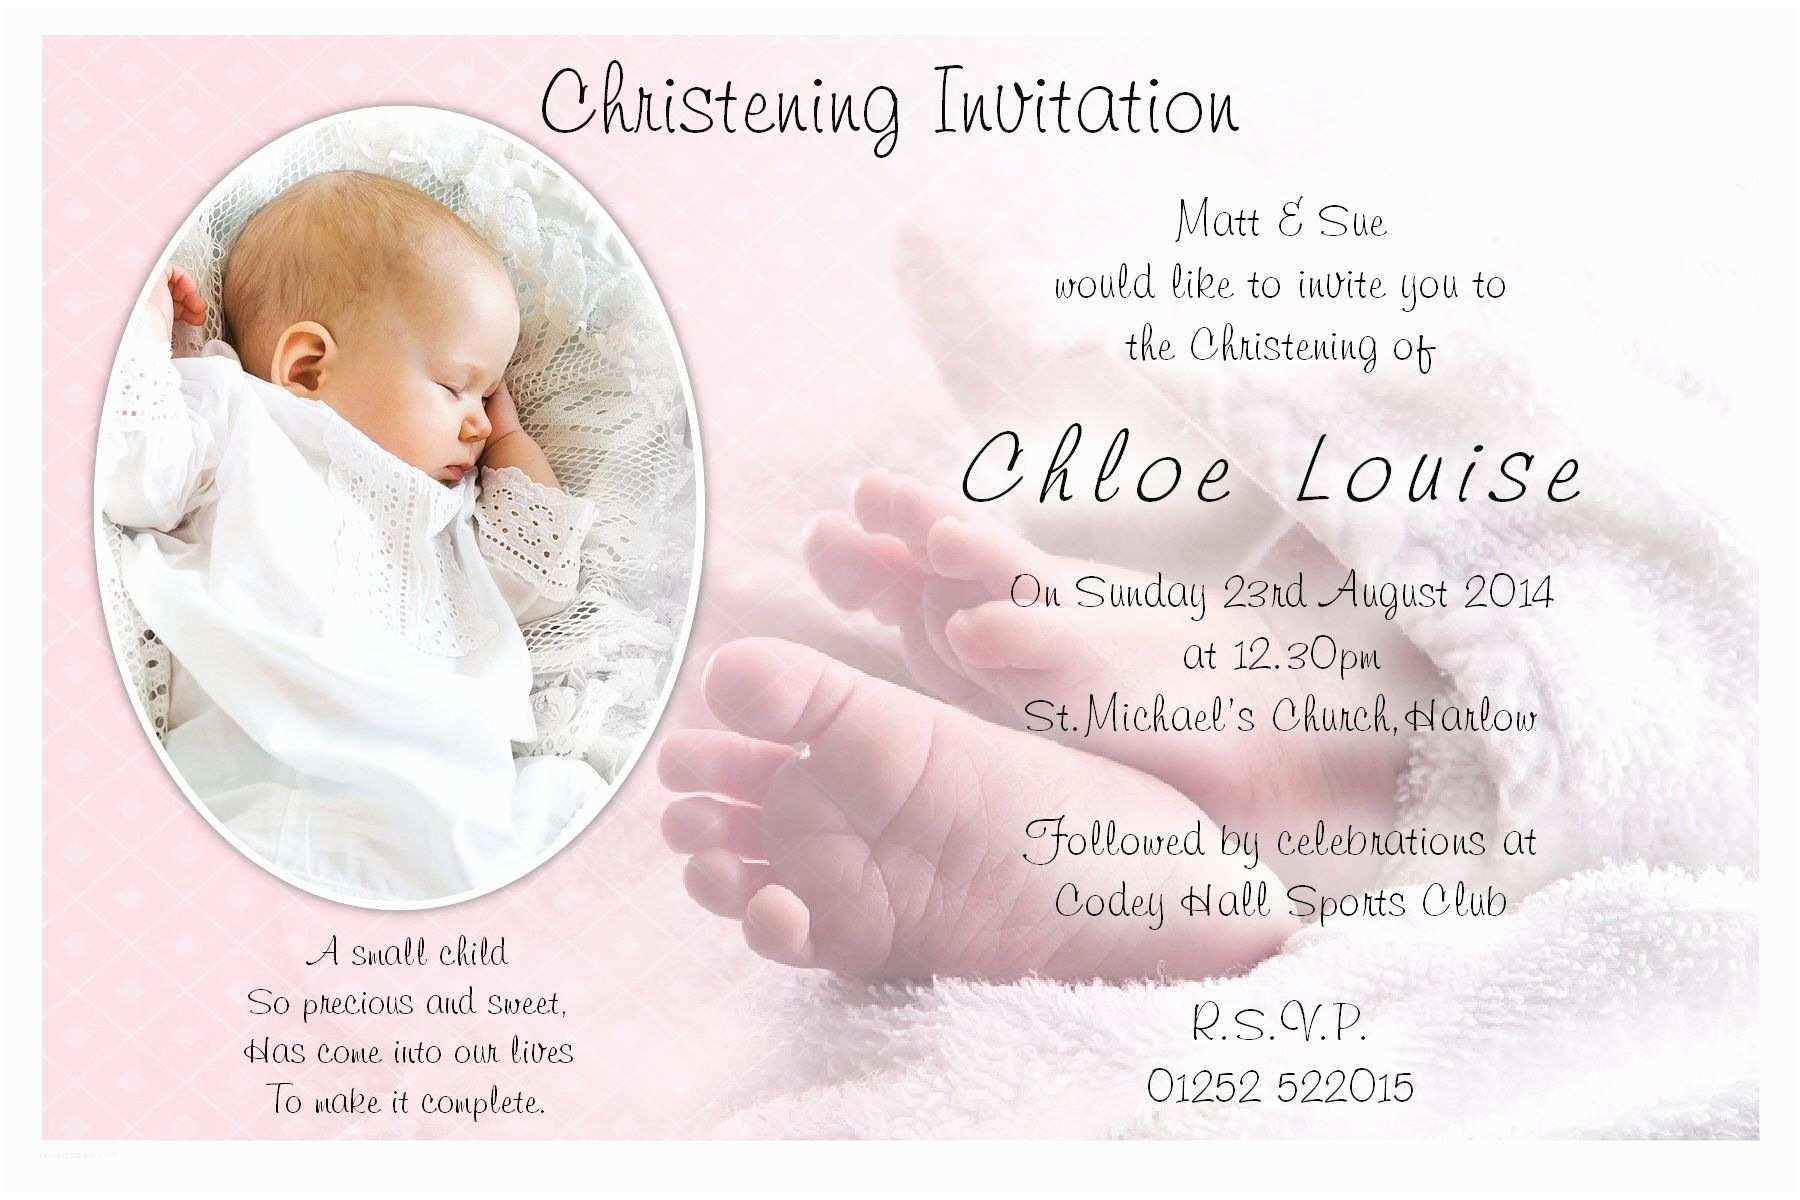 Baby Christening Invitations Baptism Invitation Blank Templates for Boy